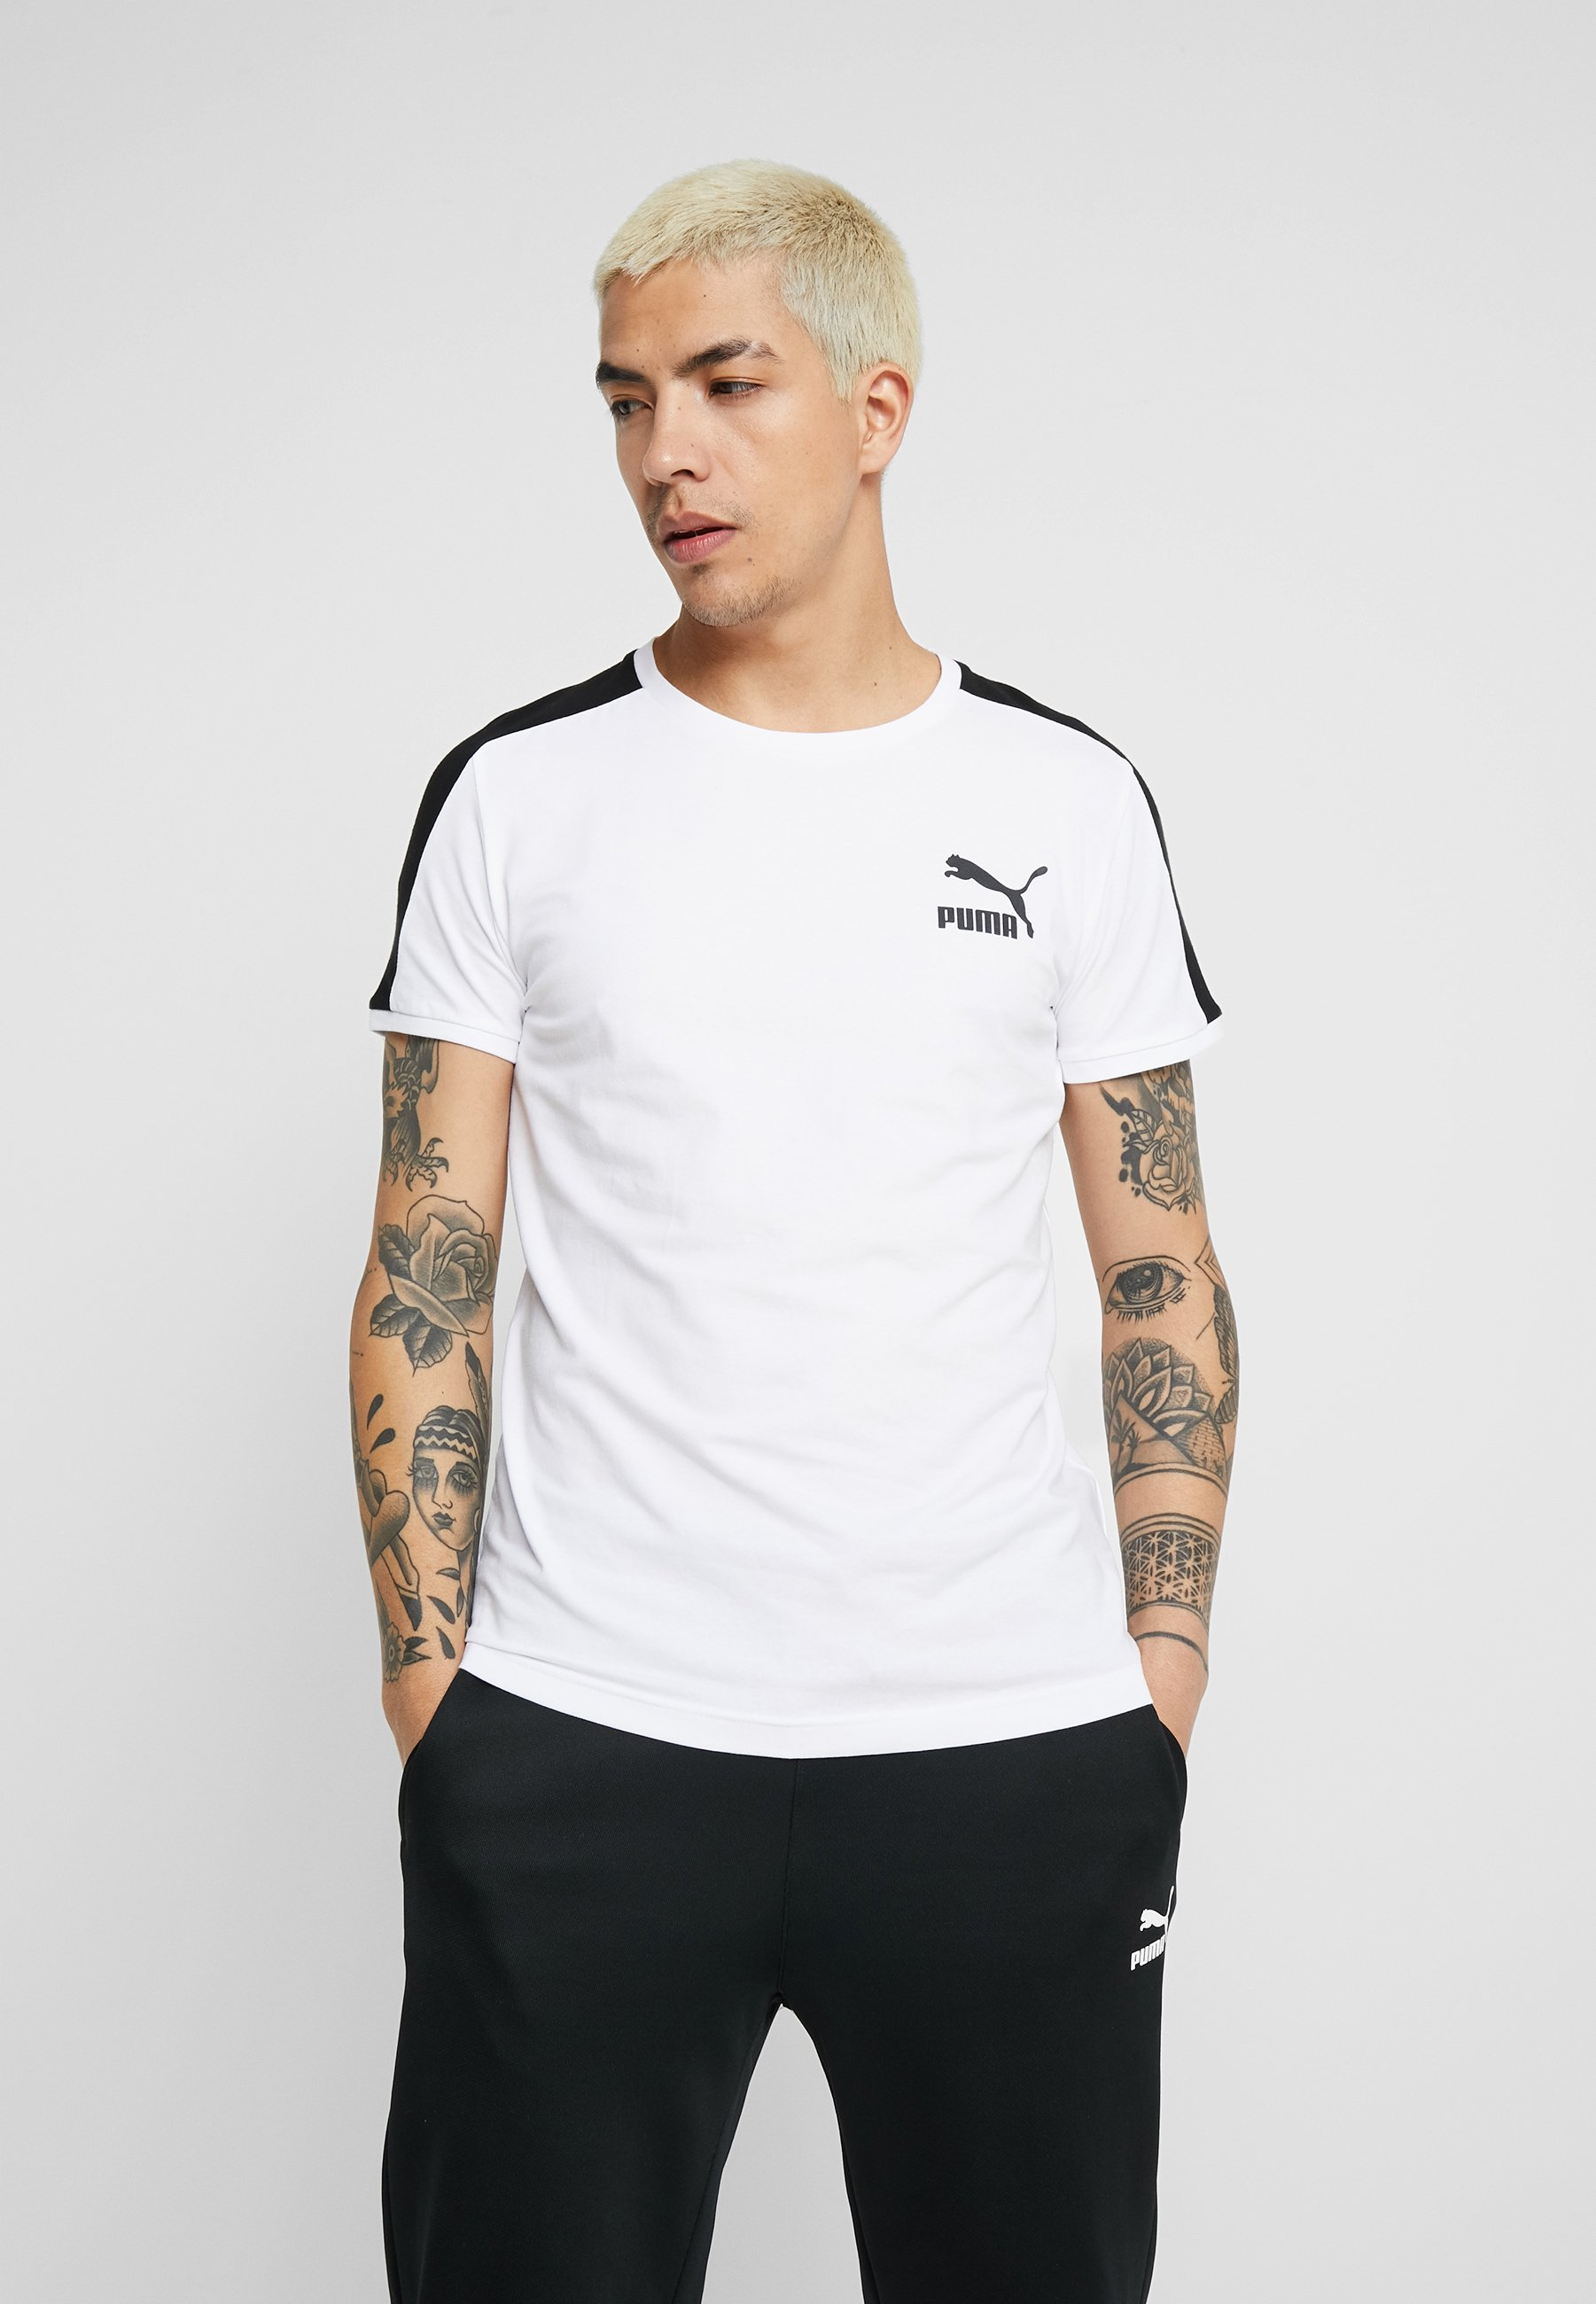 Iconic Tee FitT Puma Slim Imprimé White shirt H2YE9WDI